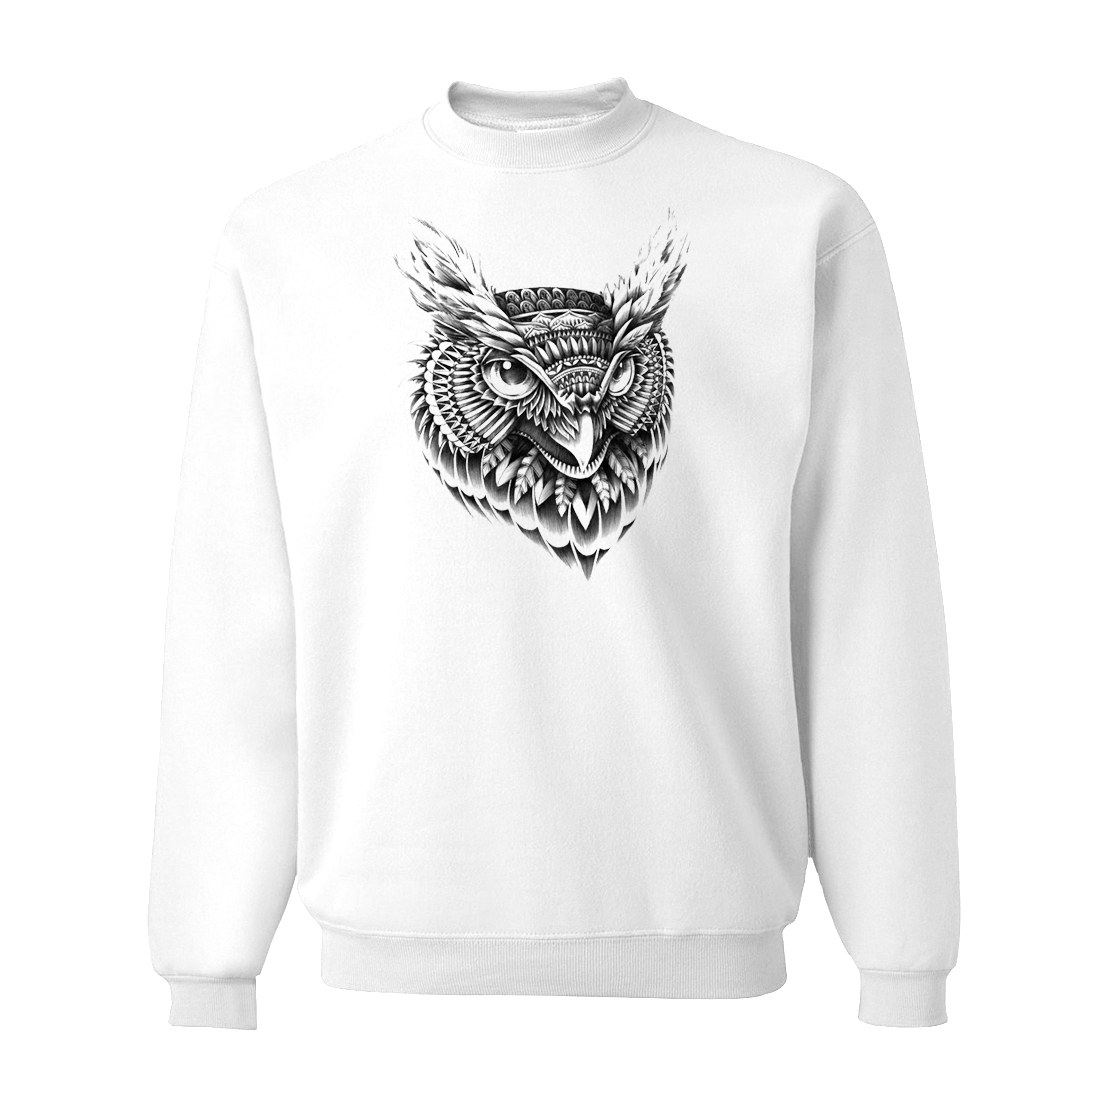 Owl White Sweatshirts For Men 2019 New Spring Animal Men's Hoodies Harajuku Sweatshirt Hip Hop Streetwear Men's Pollovers CM01